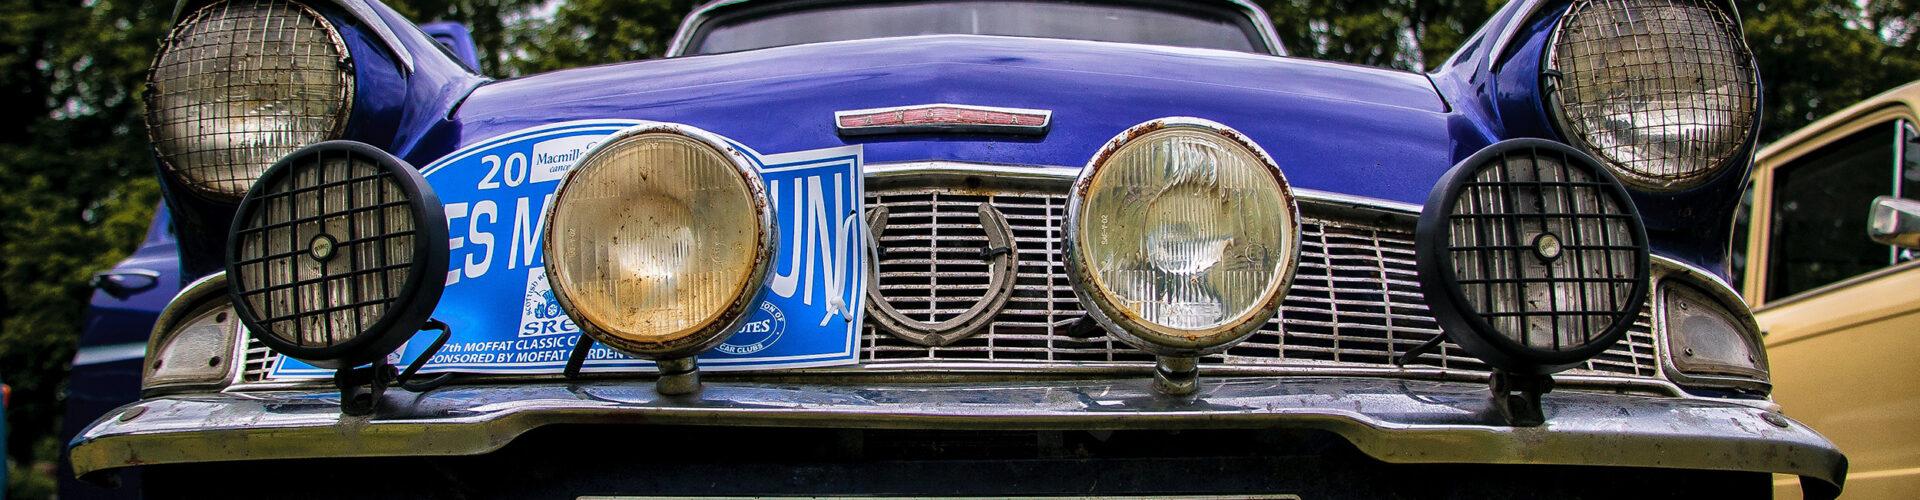 Parked blue car